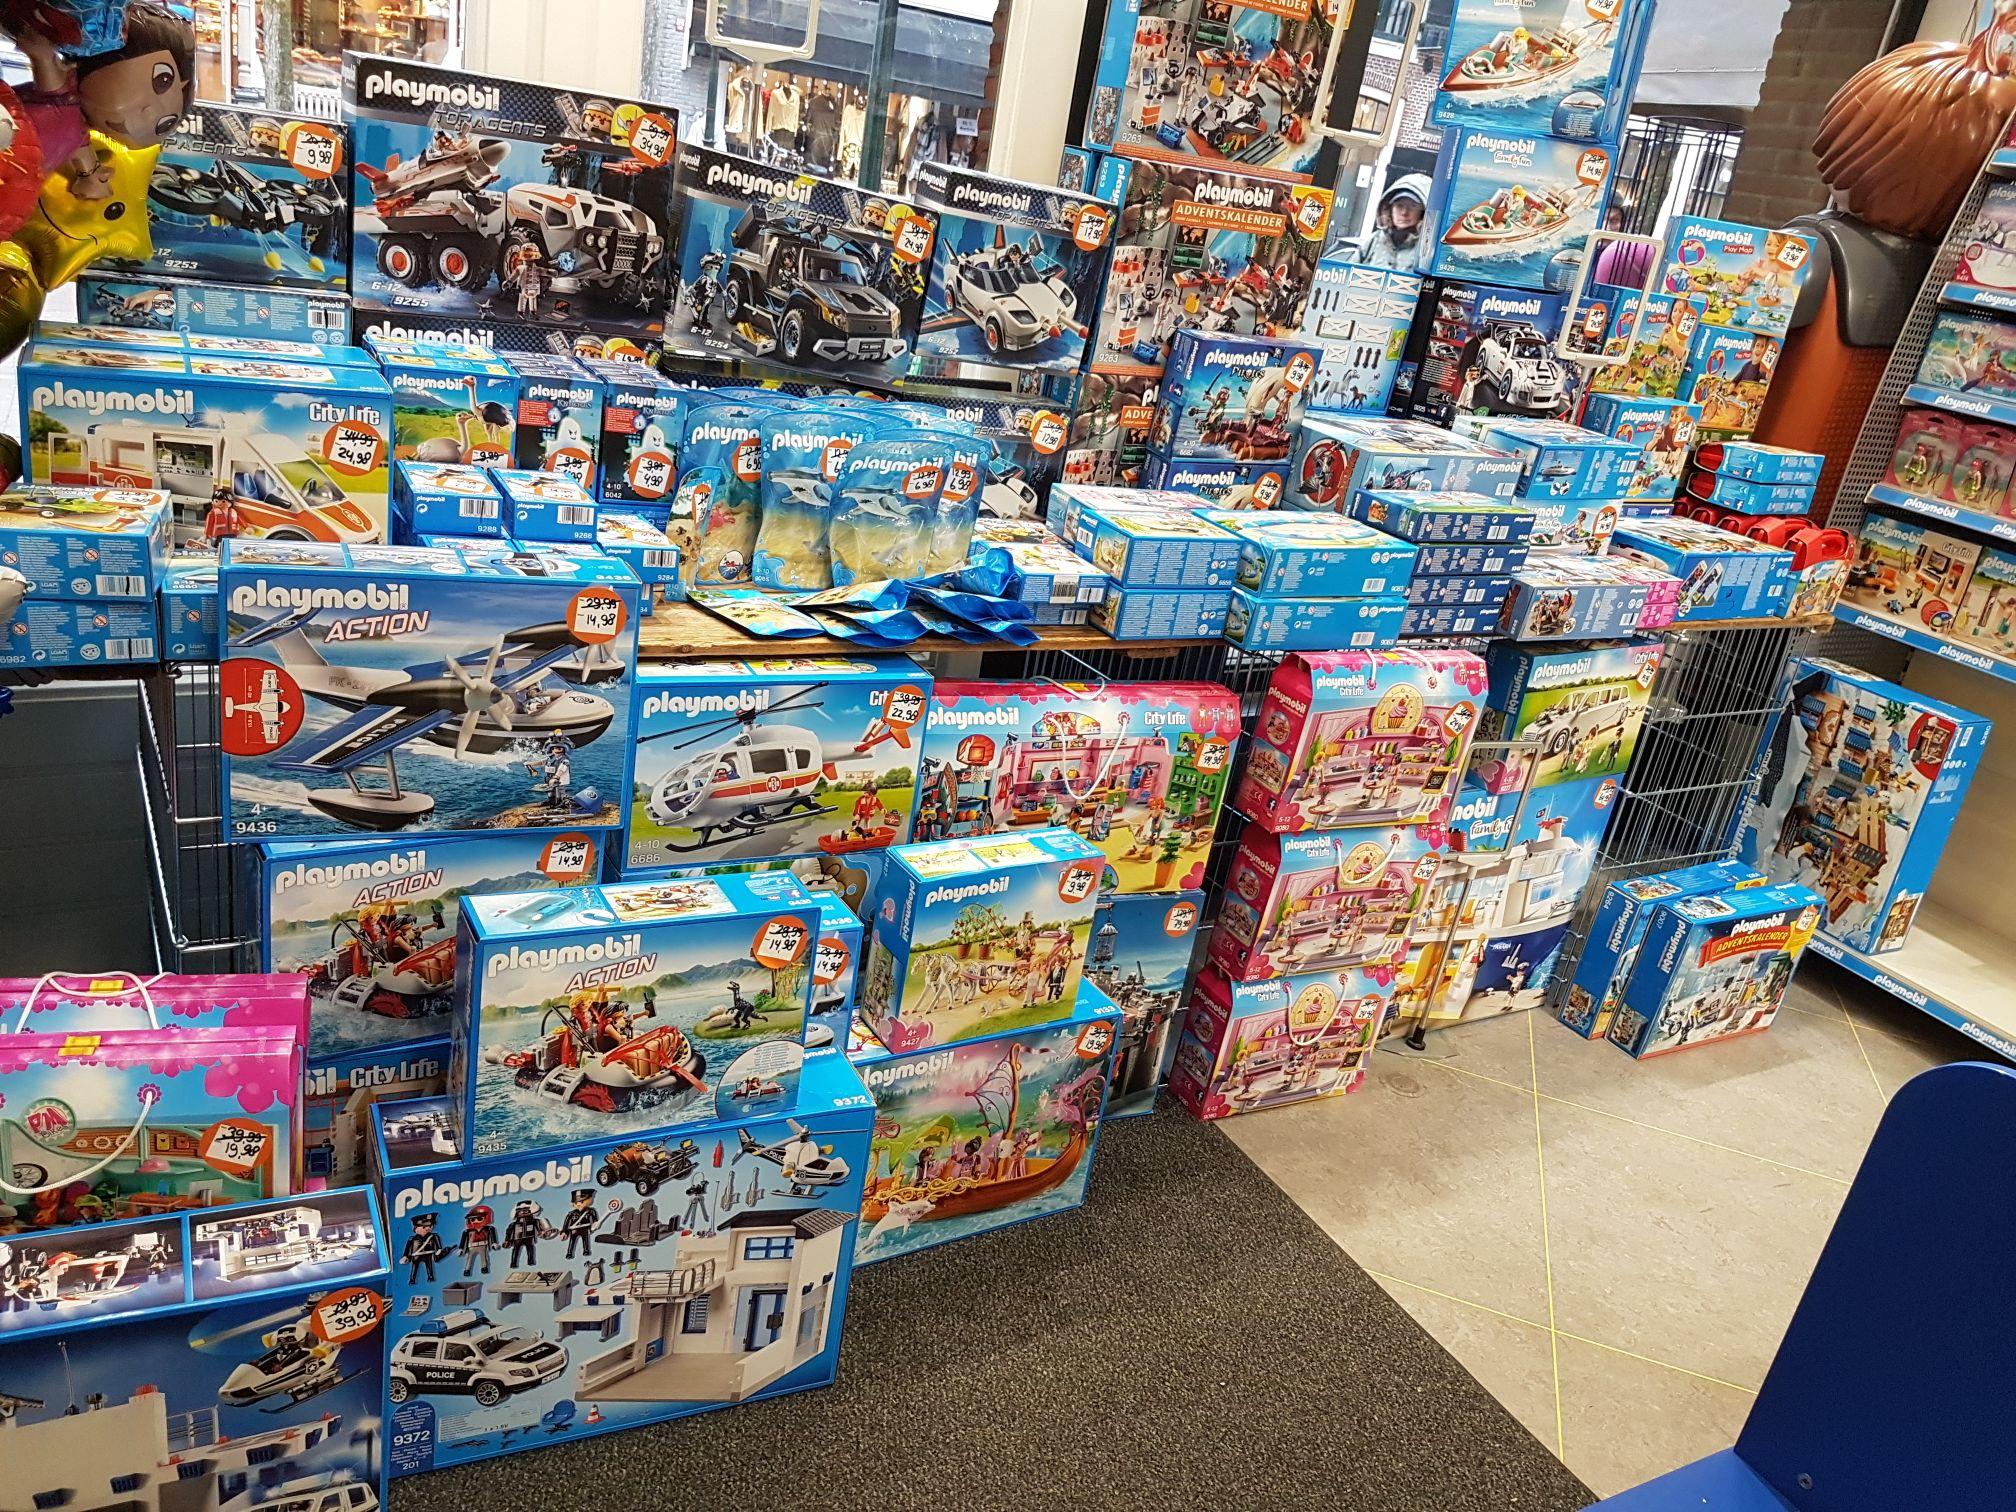 Tot 50% korting veel Playmobil @Intertoys harlingen (lokaal)